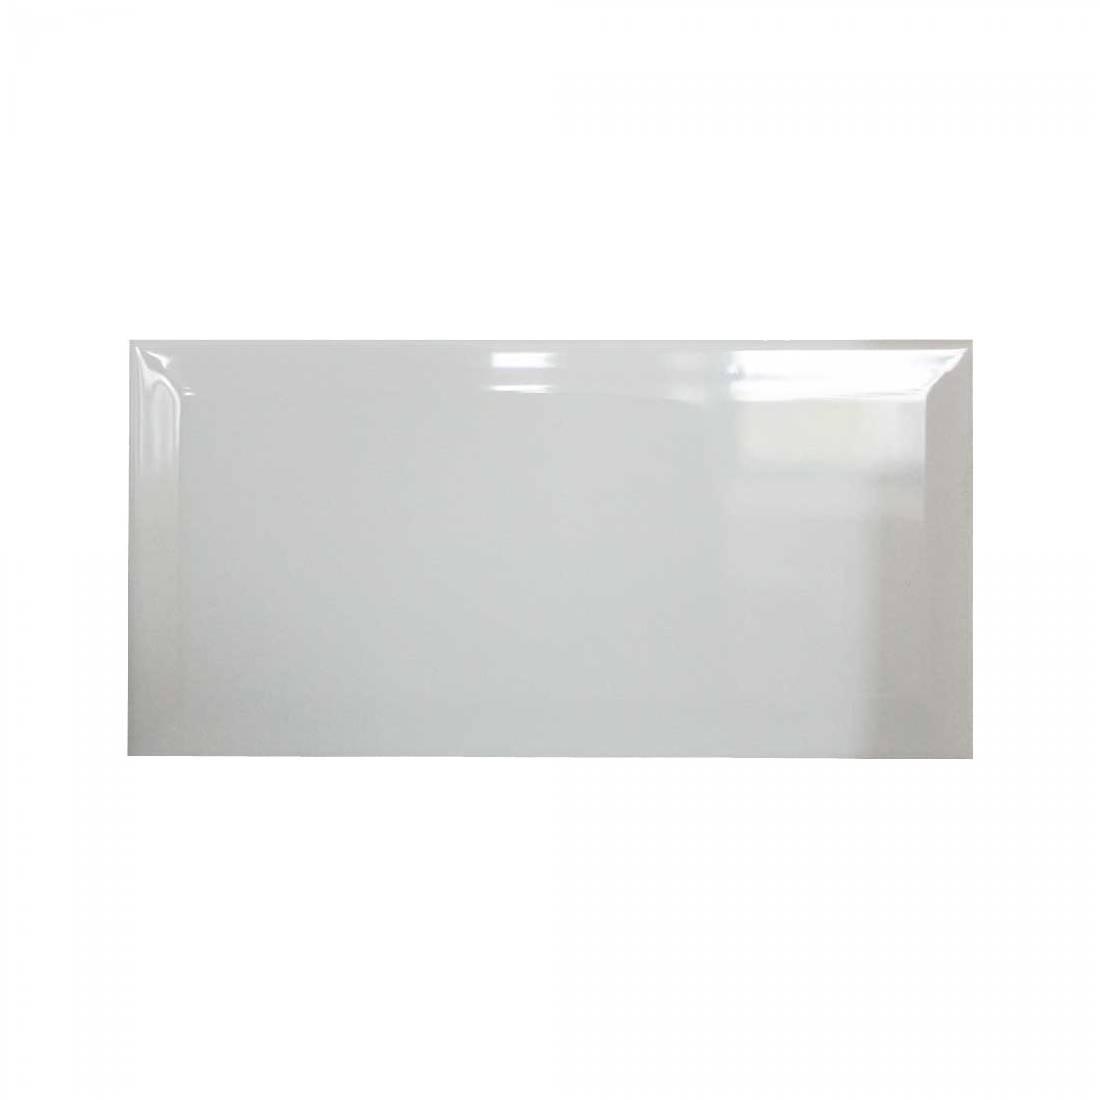 Biselado 10x20 White Gloss 1